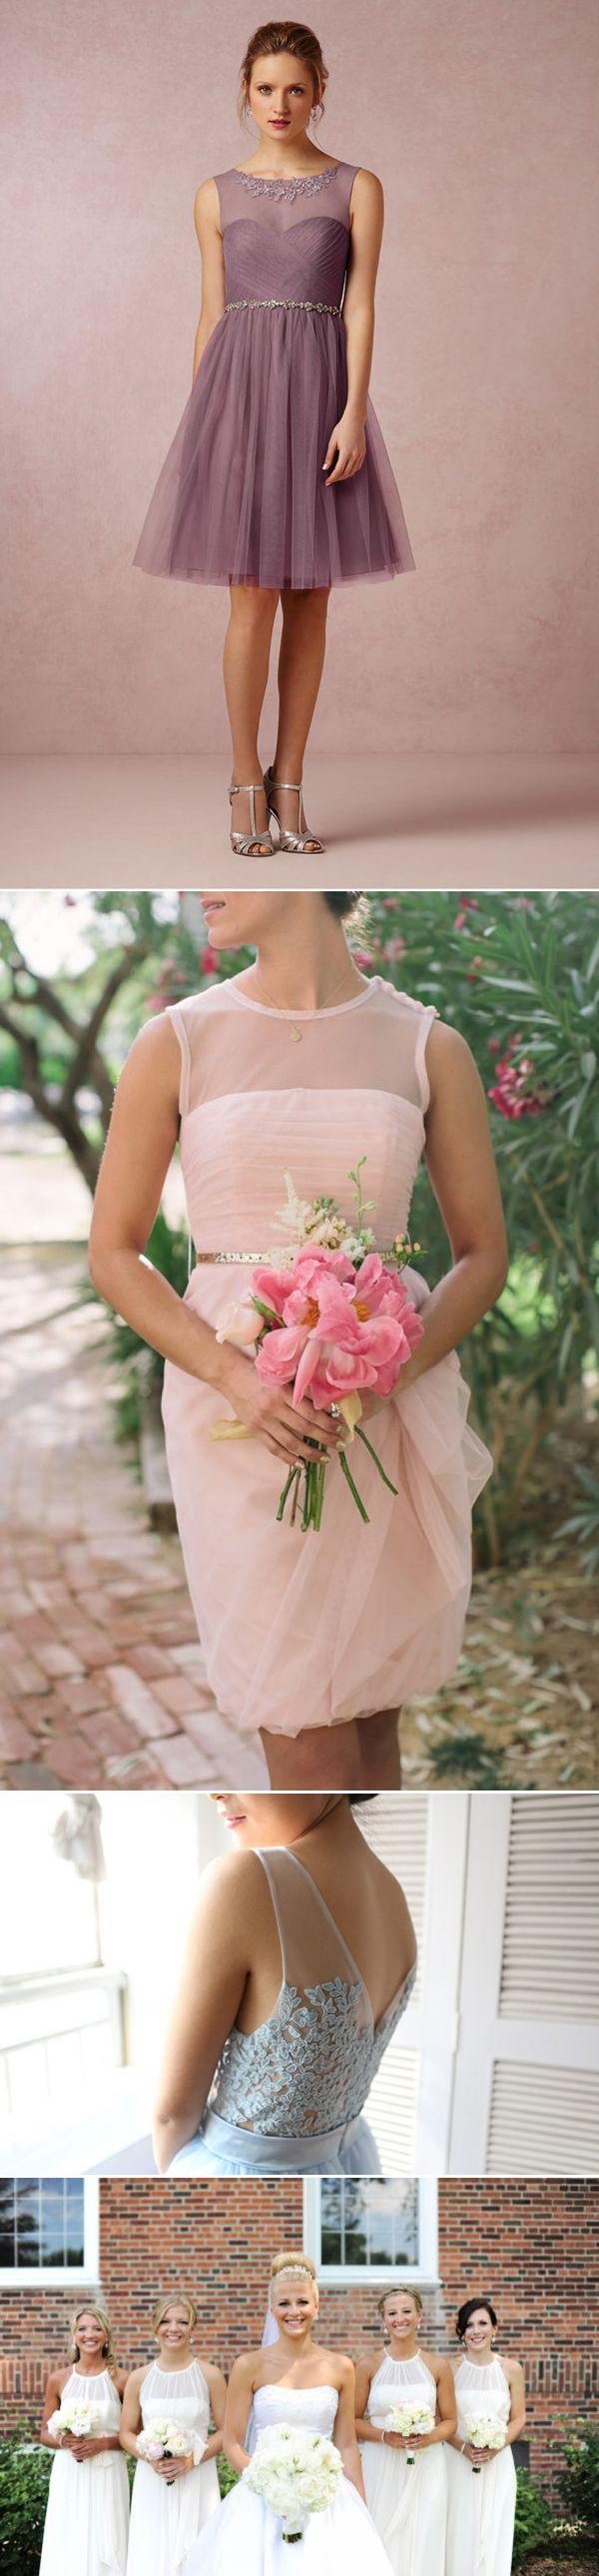 Top 8 Bridesmaid Dress Trends for Summer 2014 - Illusion Necklines